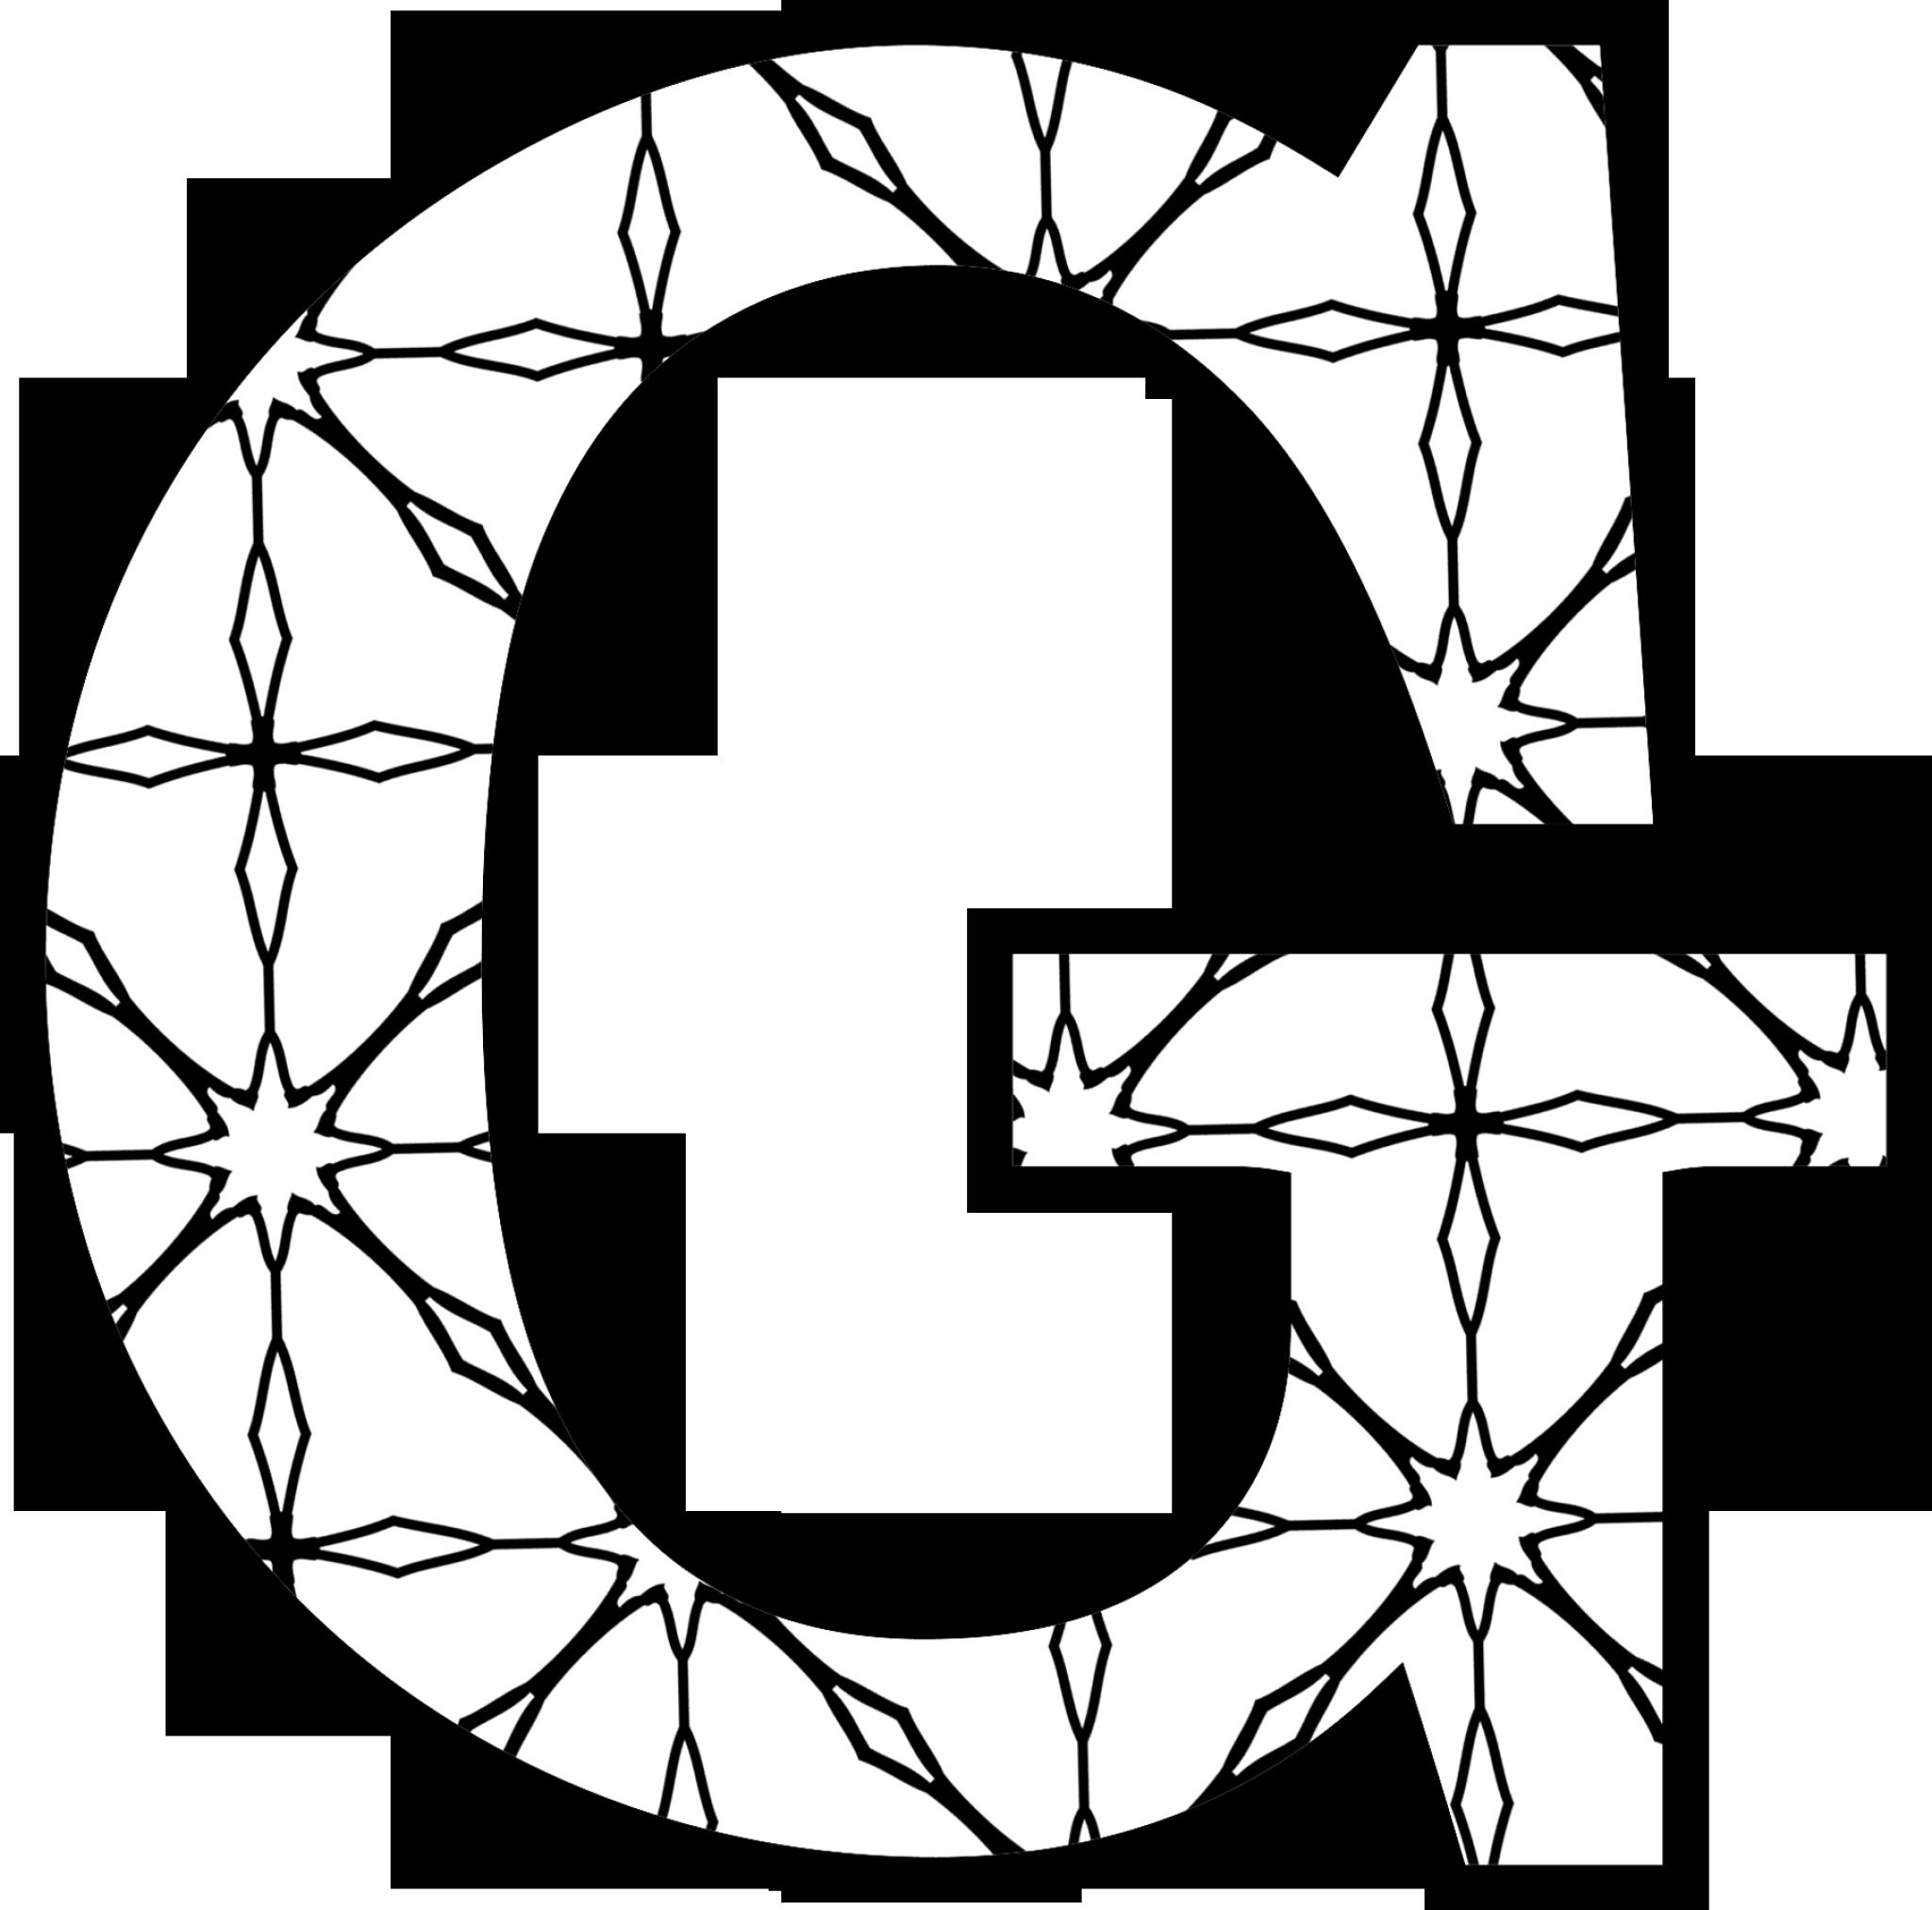 g_awaywiththepixels.png 2,048×2,025 pixels Lettering